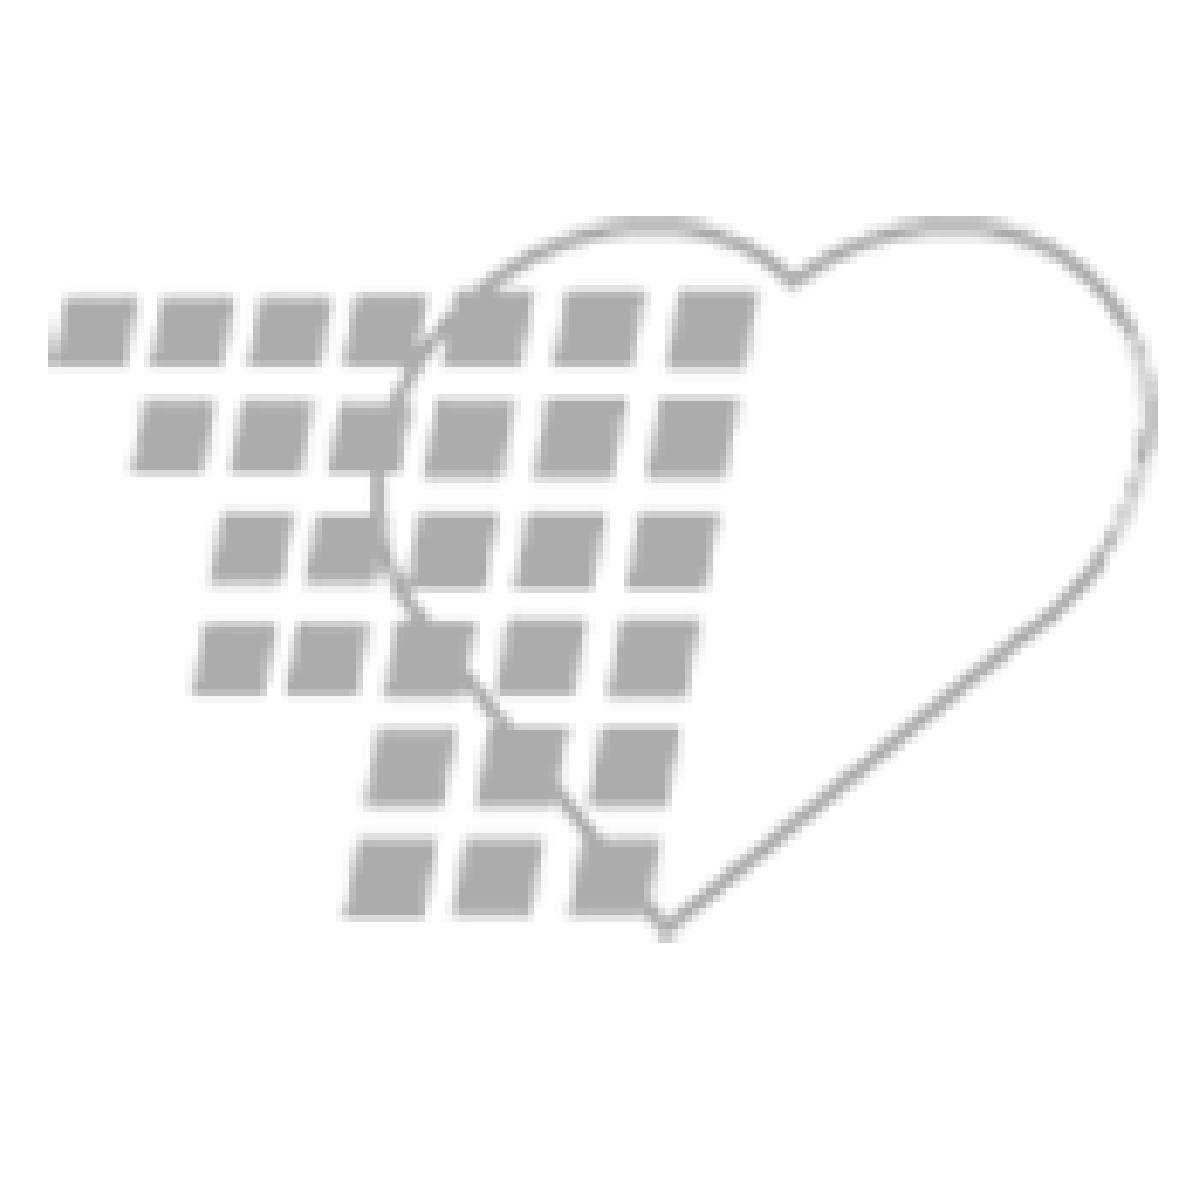 07-71-5002 The Soft-Touch Timeter ® Flowmeter